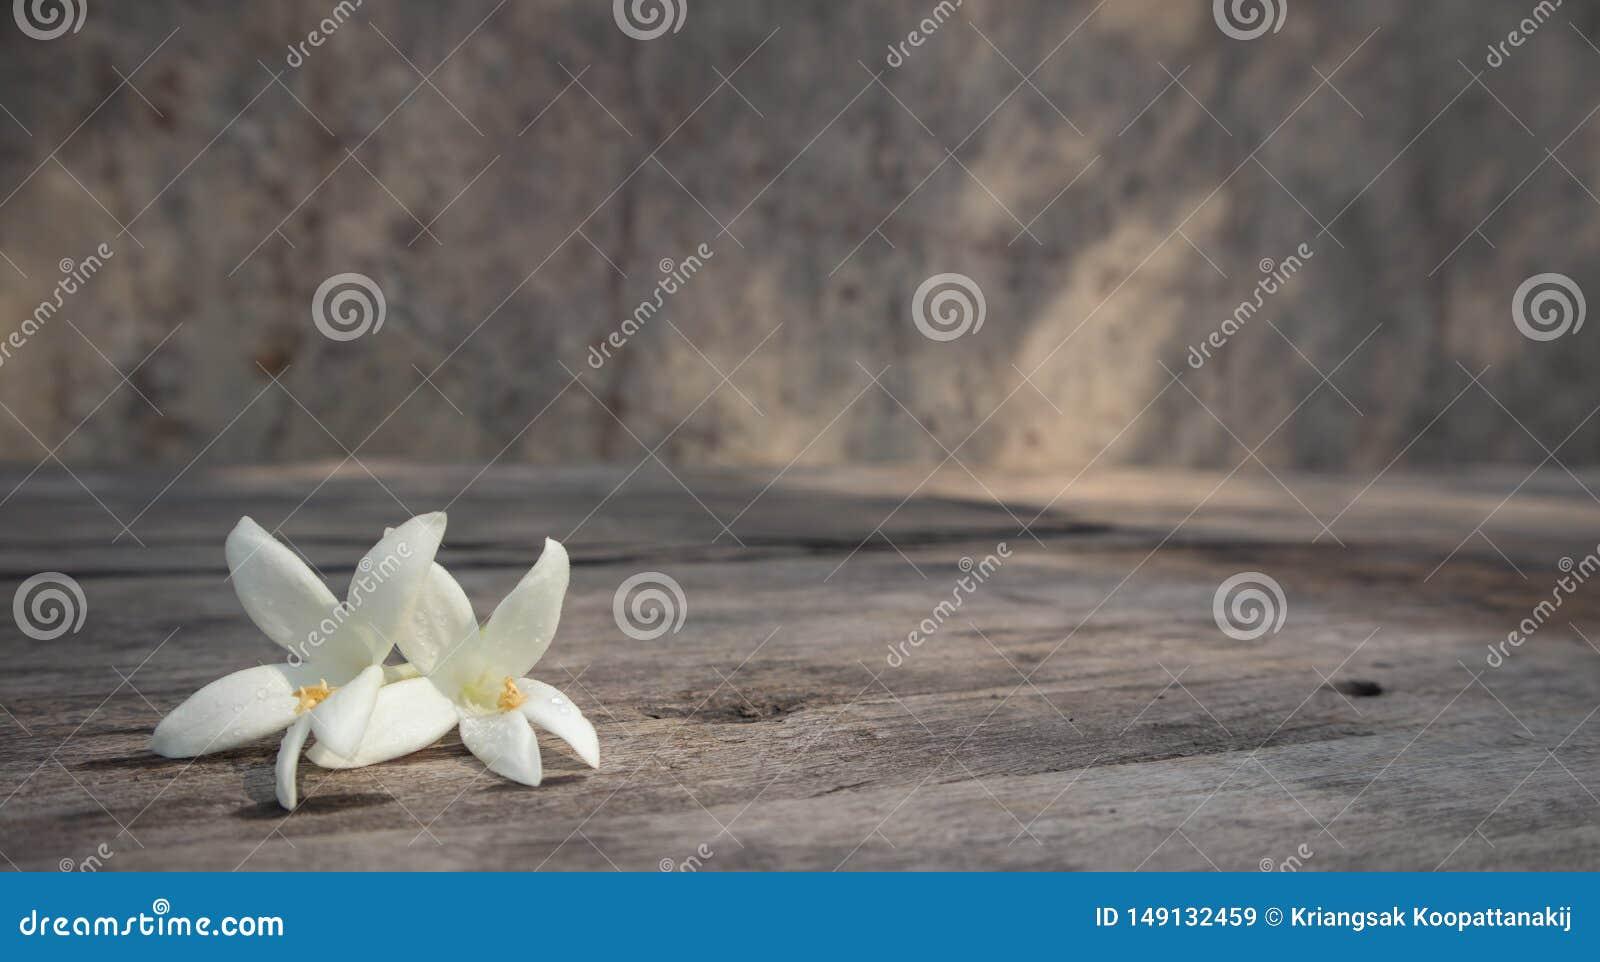 Millingtonia blanco en la tabla de madera